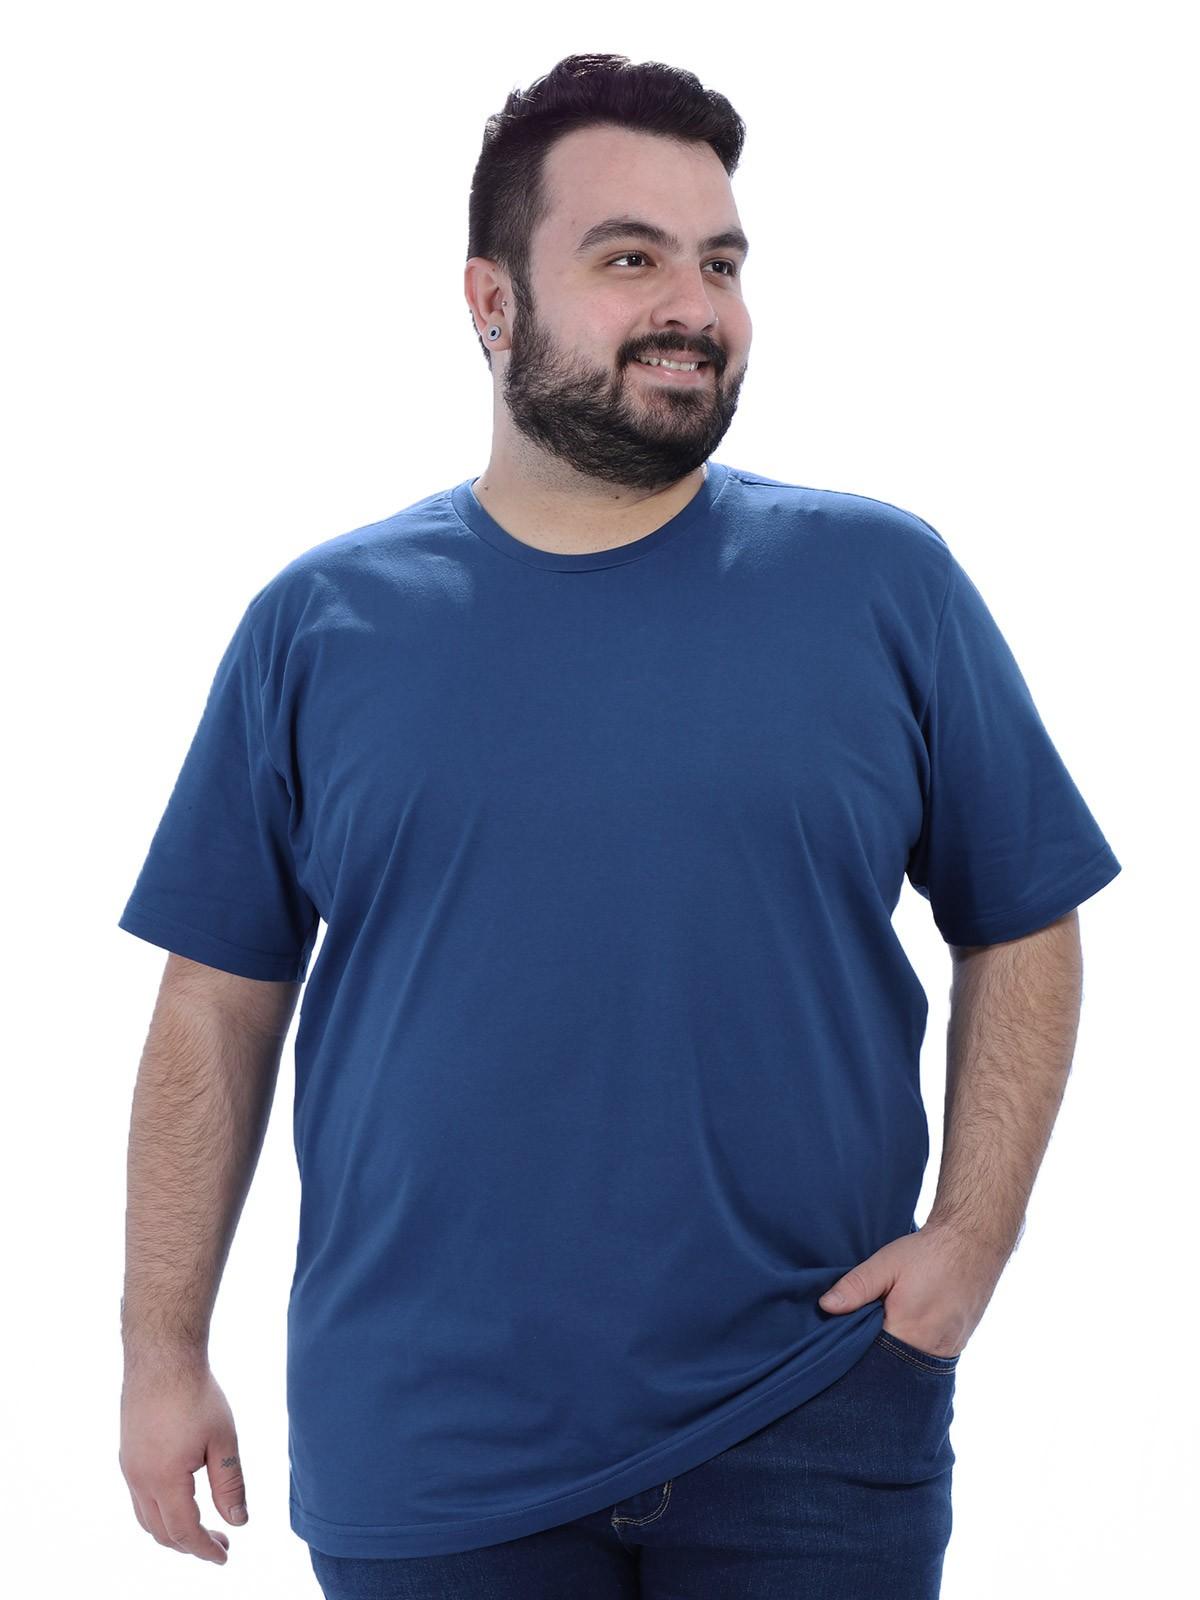 Camiseta Plus Size Masculino Lisa Azul Jeans